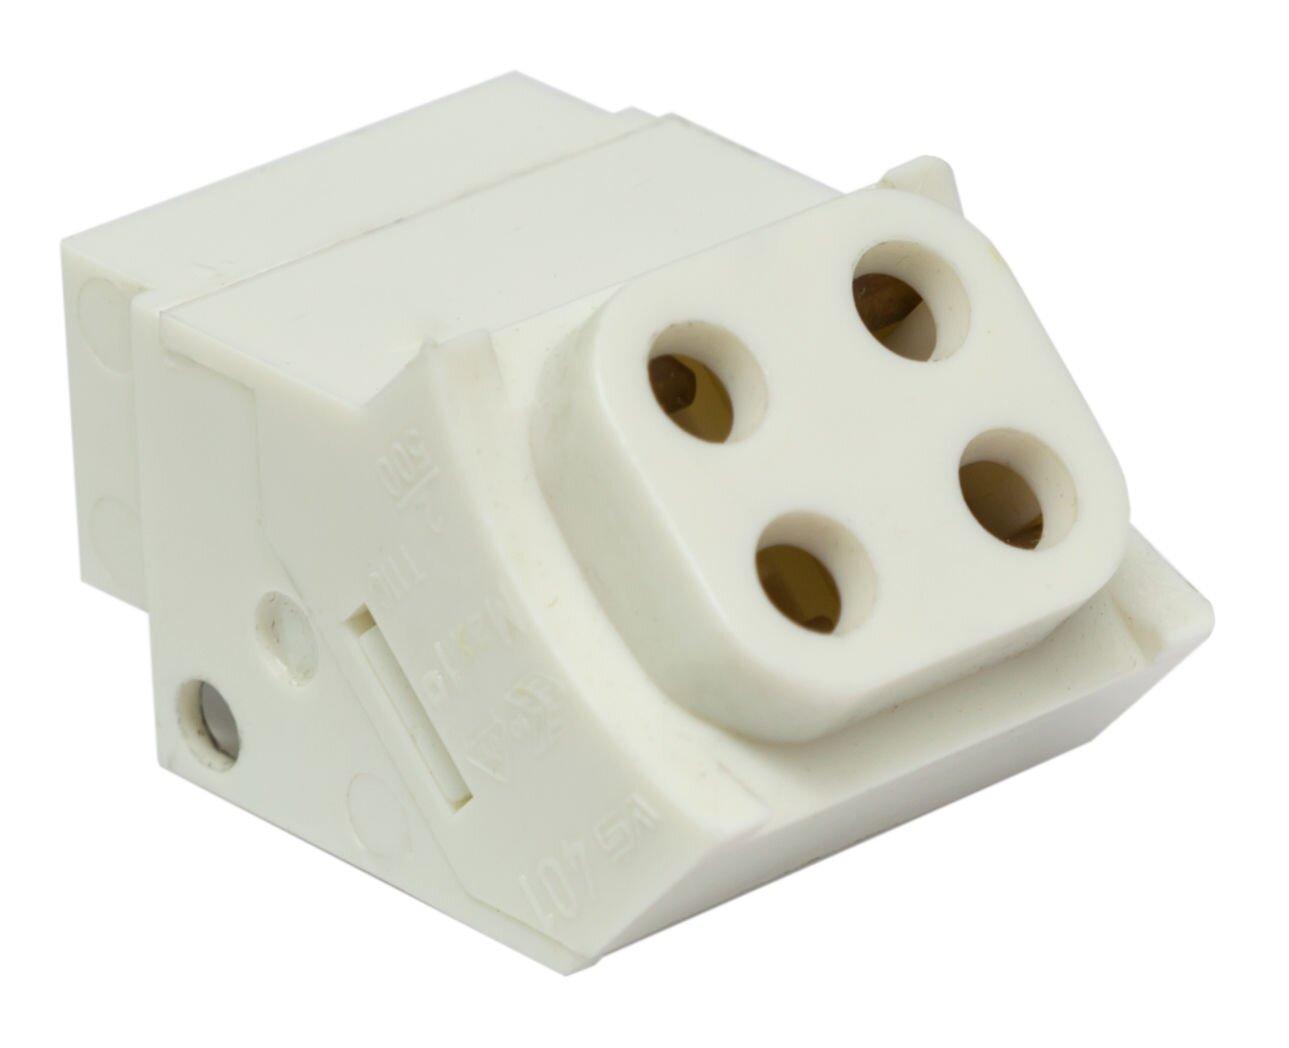 Патрон g10q для ламп с цоколем  4p se, - фото pic_95981df05525df5_1920x9000_1.jpg